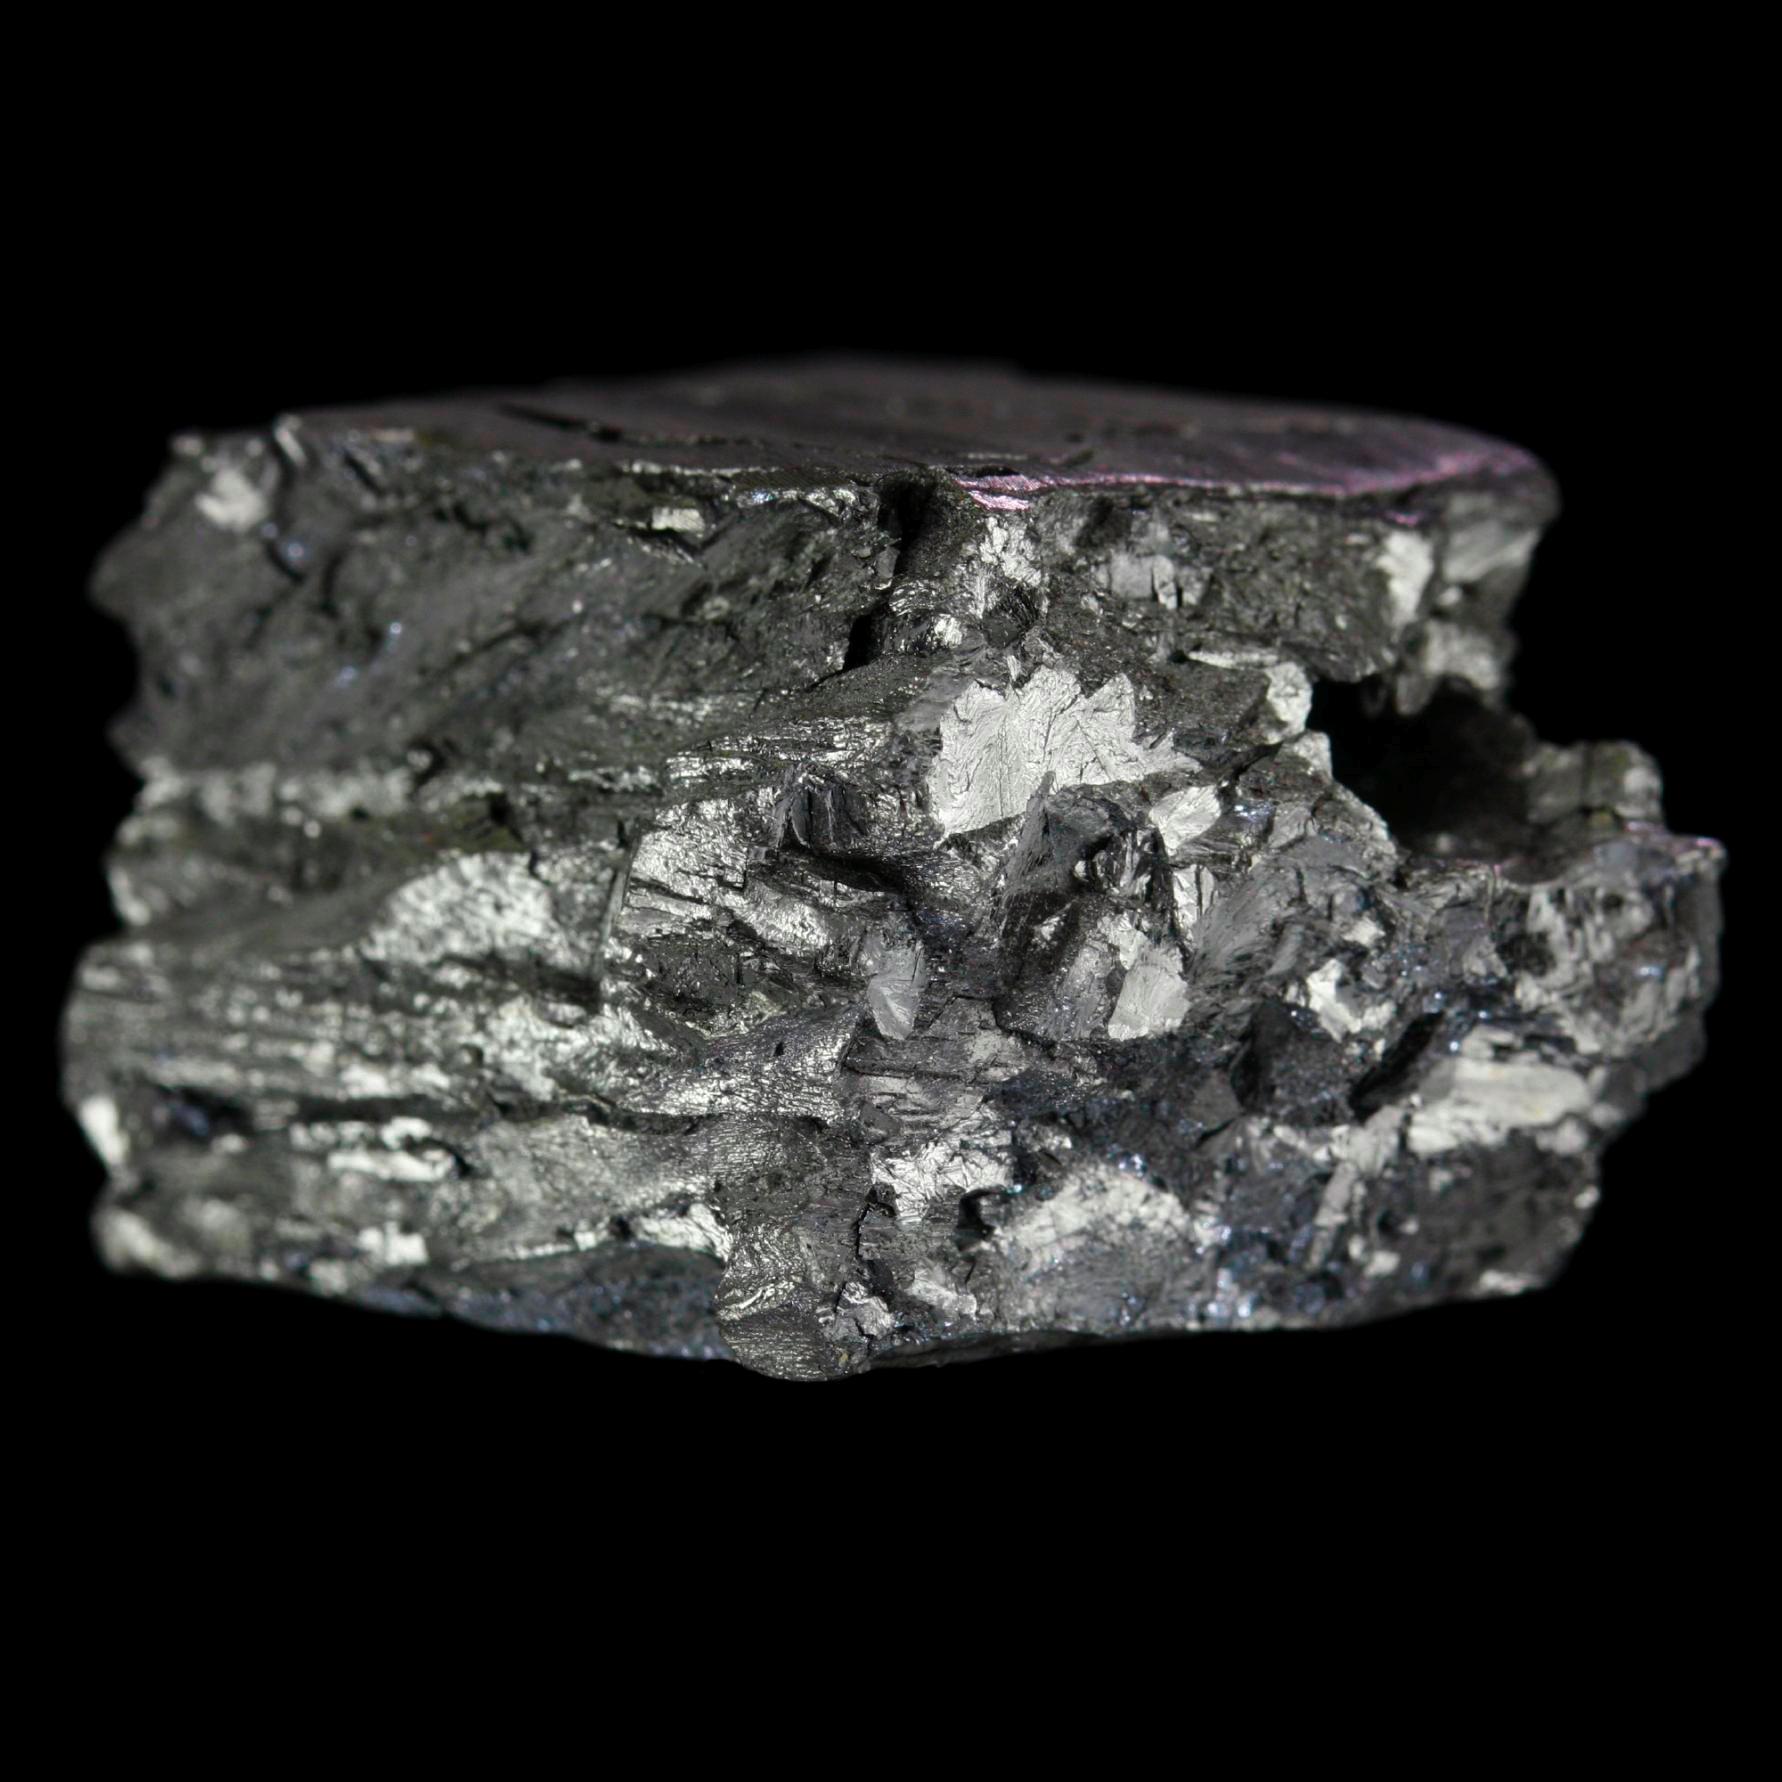 Sample Of The Element Beryllium In The Periodic Table